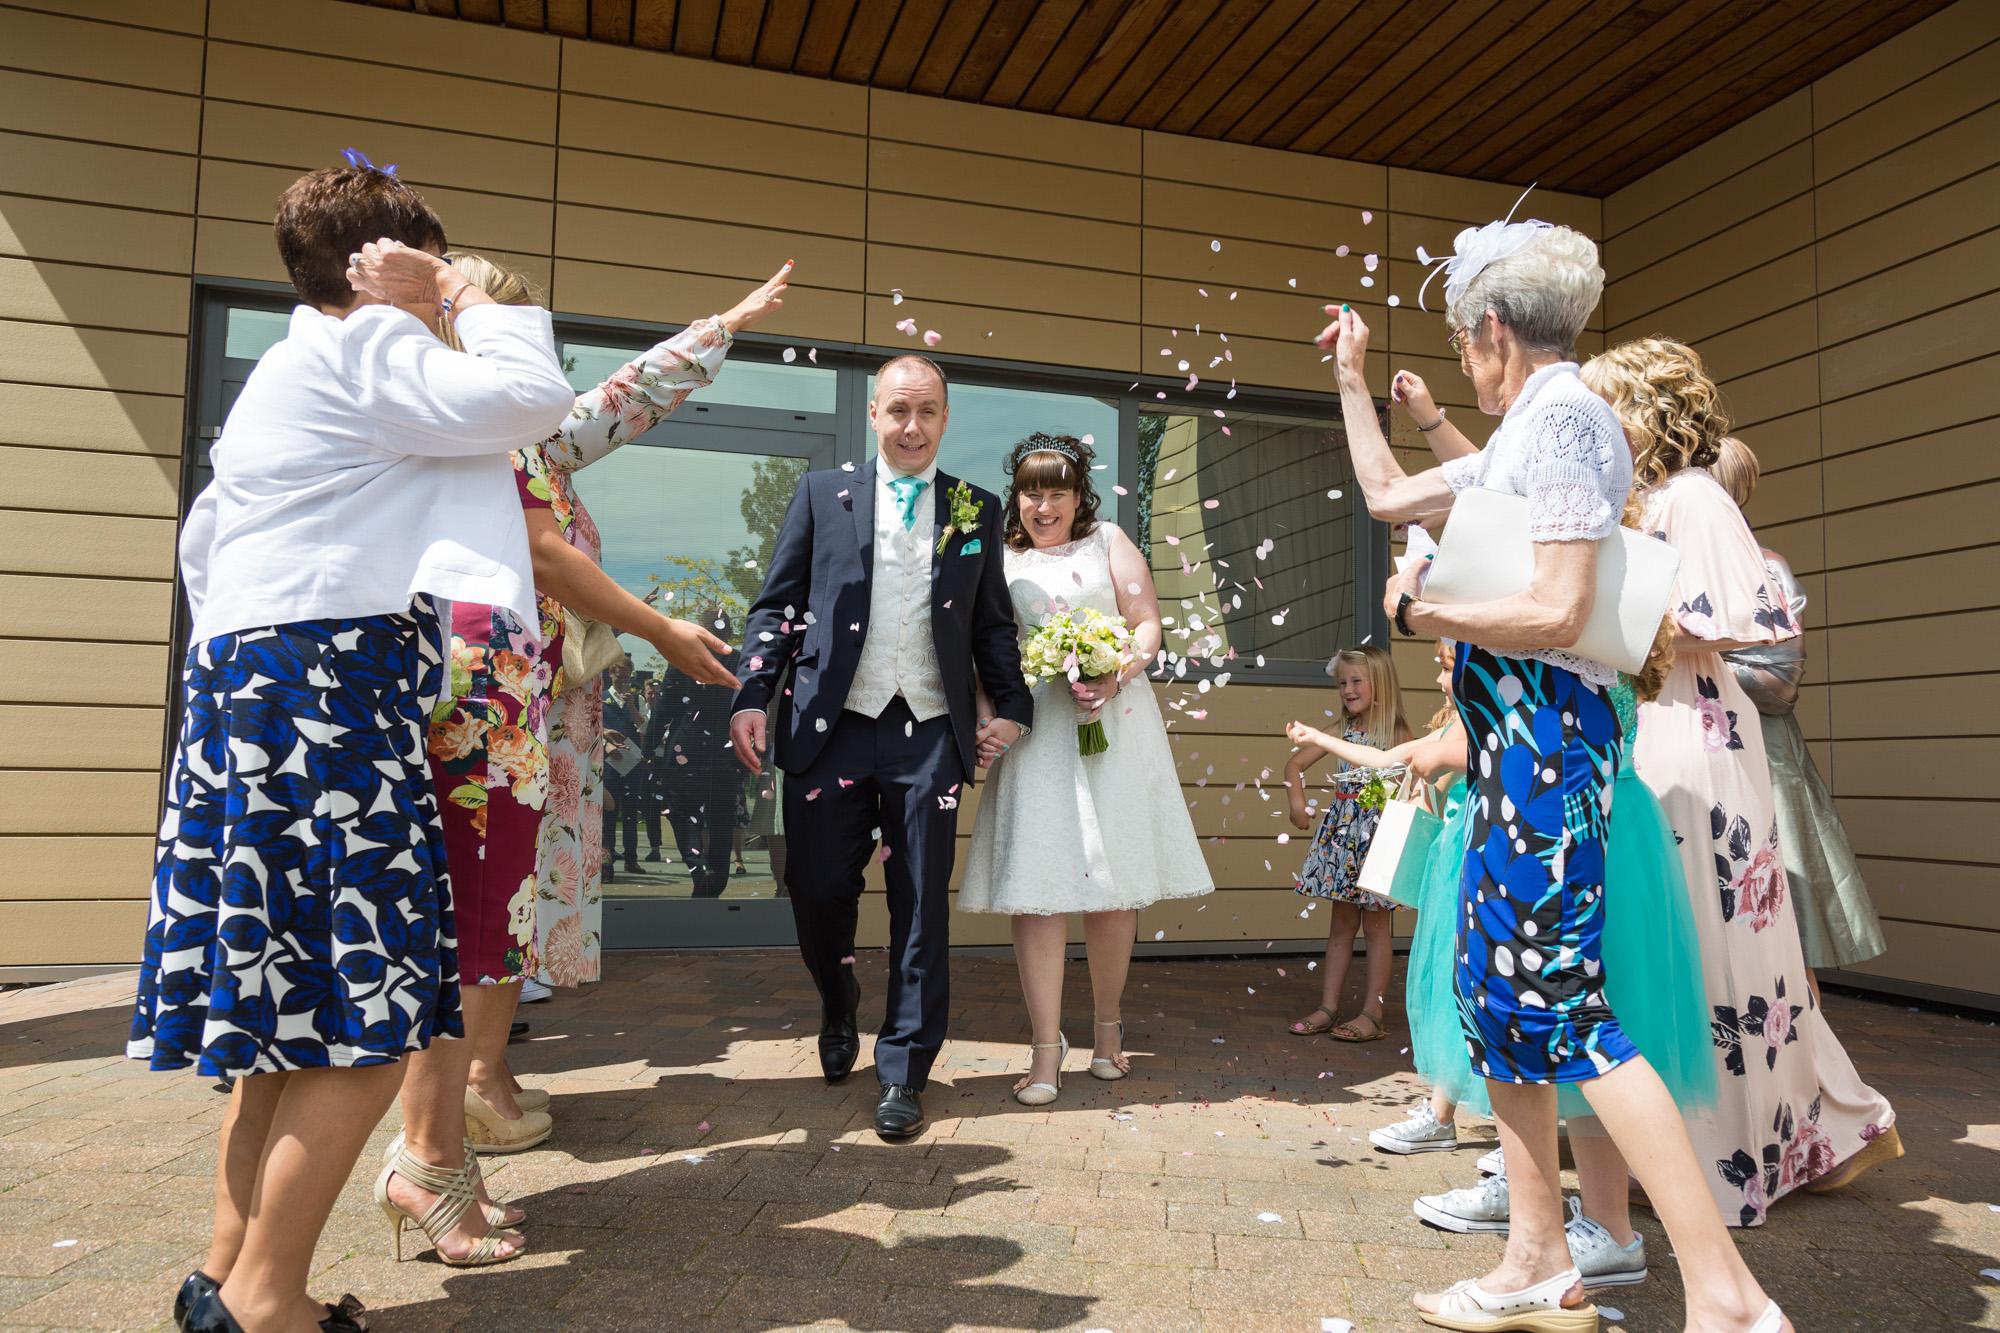 wedding photographer caerphilly, cardiff, penallta registry office